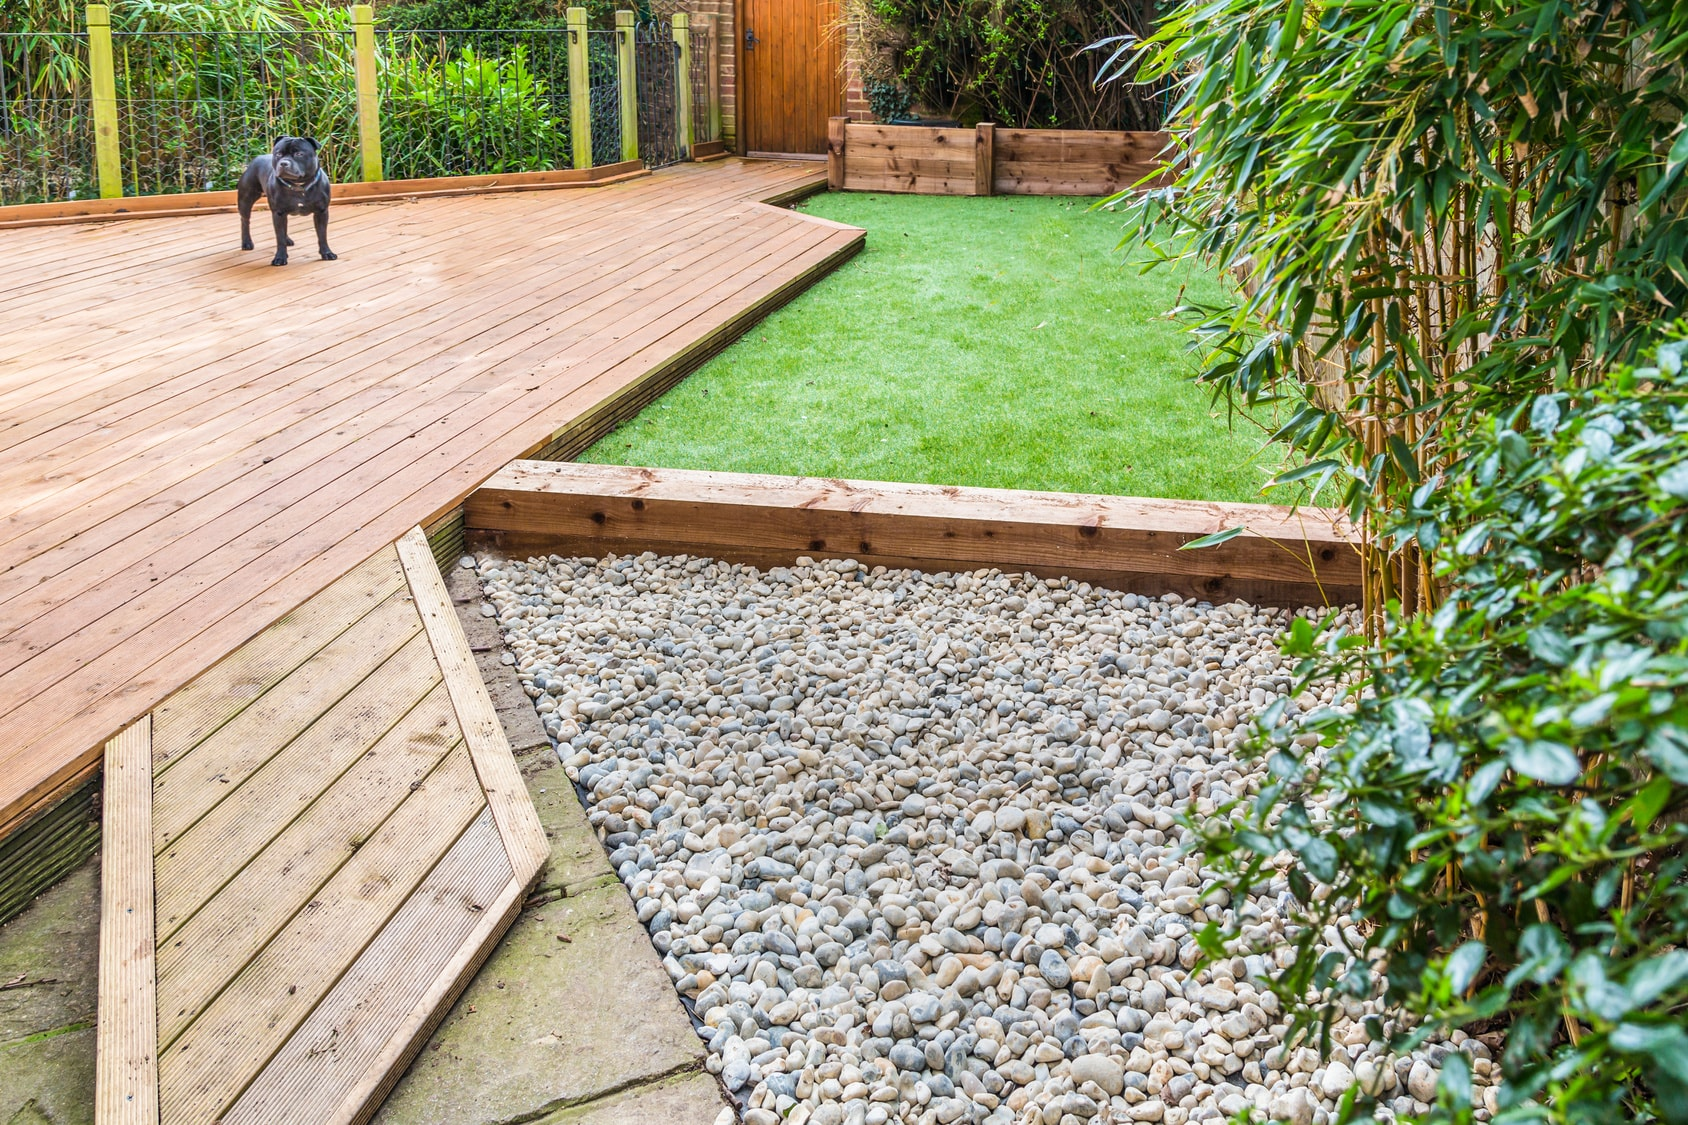 Garden research stats UK 2019